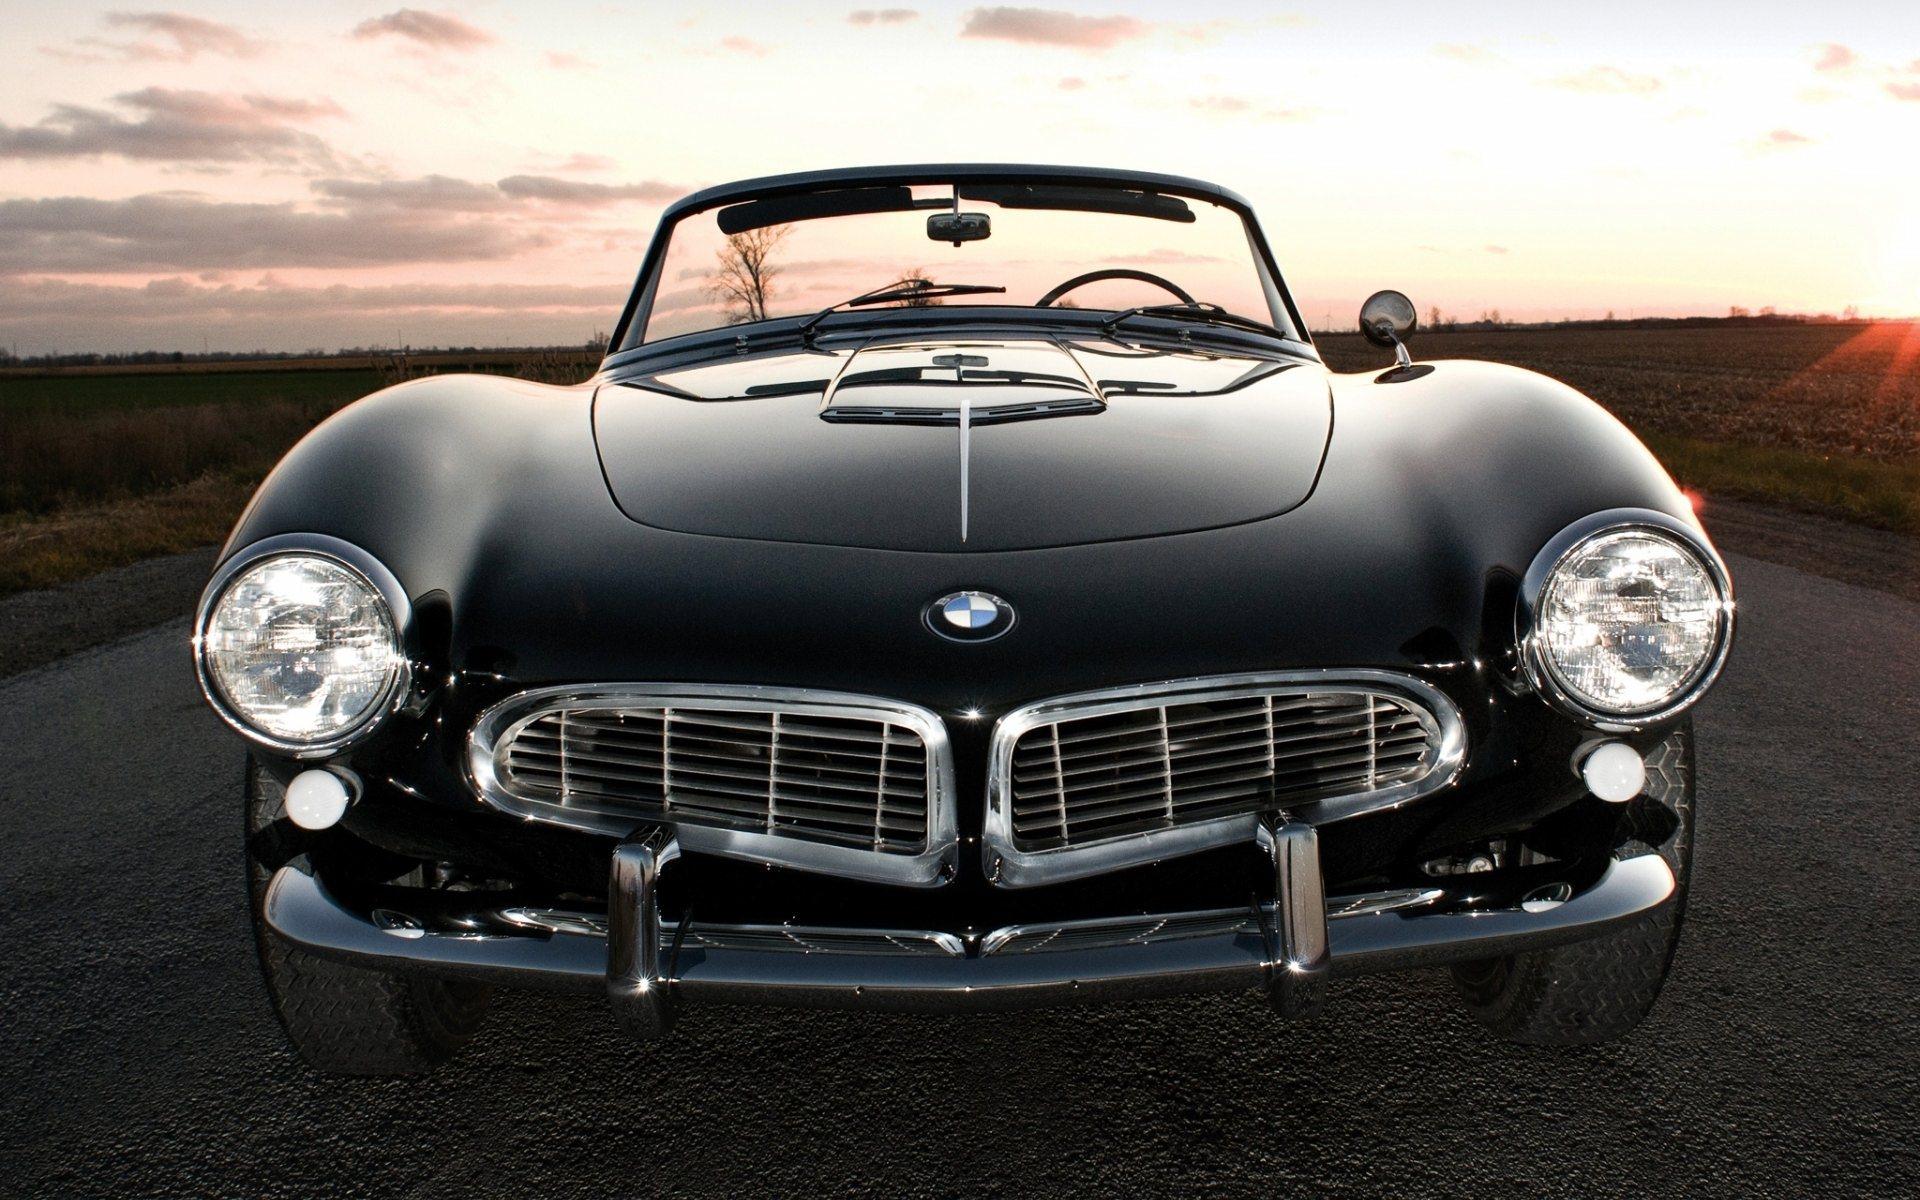 BMW Classic Car Widescreen HD Wallpaper 1920x1200